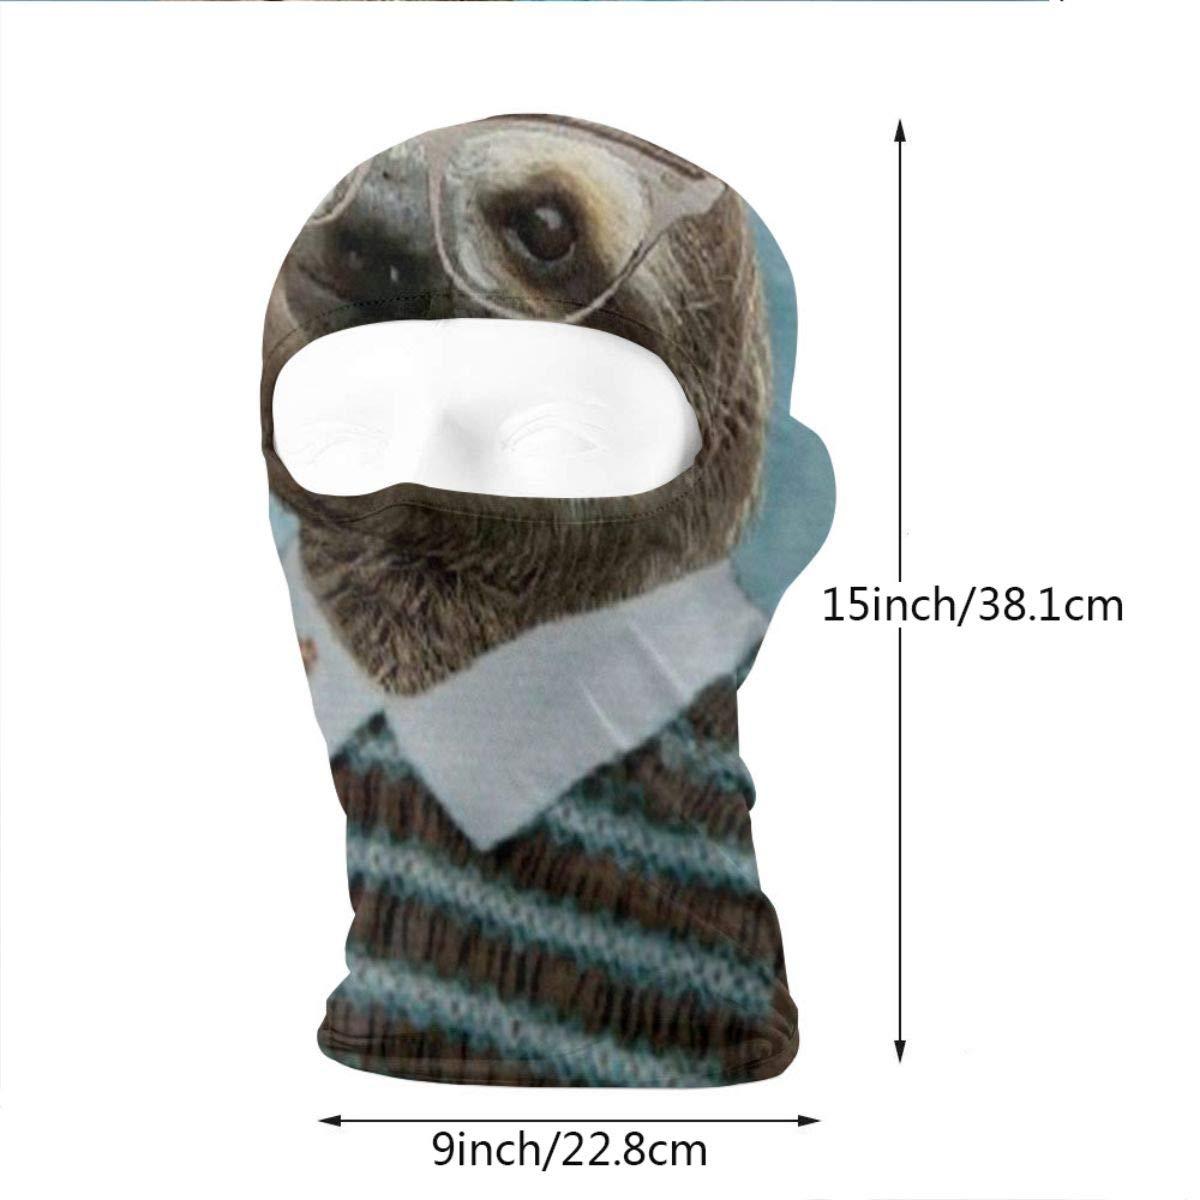 Wind-Resistant Face Mask LaoJi Miss Sloth Winter Ski Mask Balaclava Hood